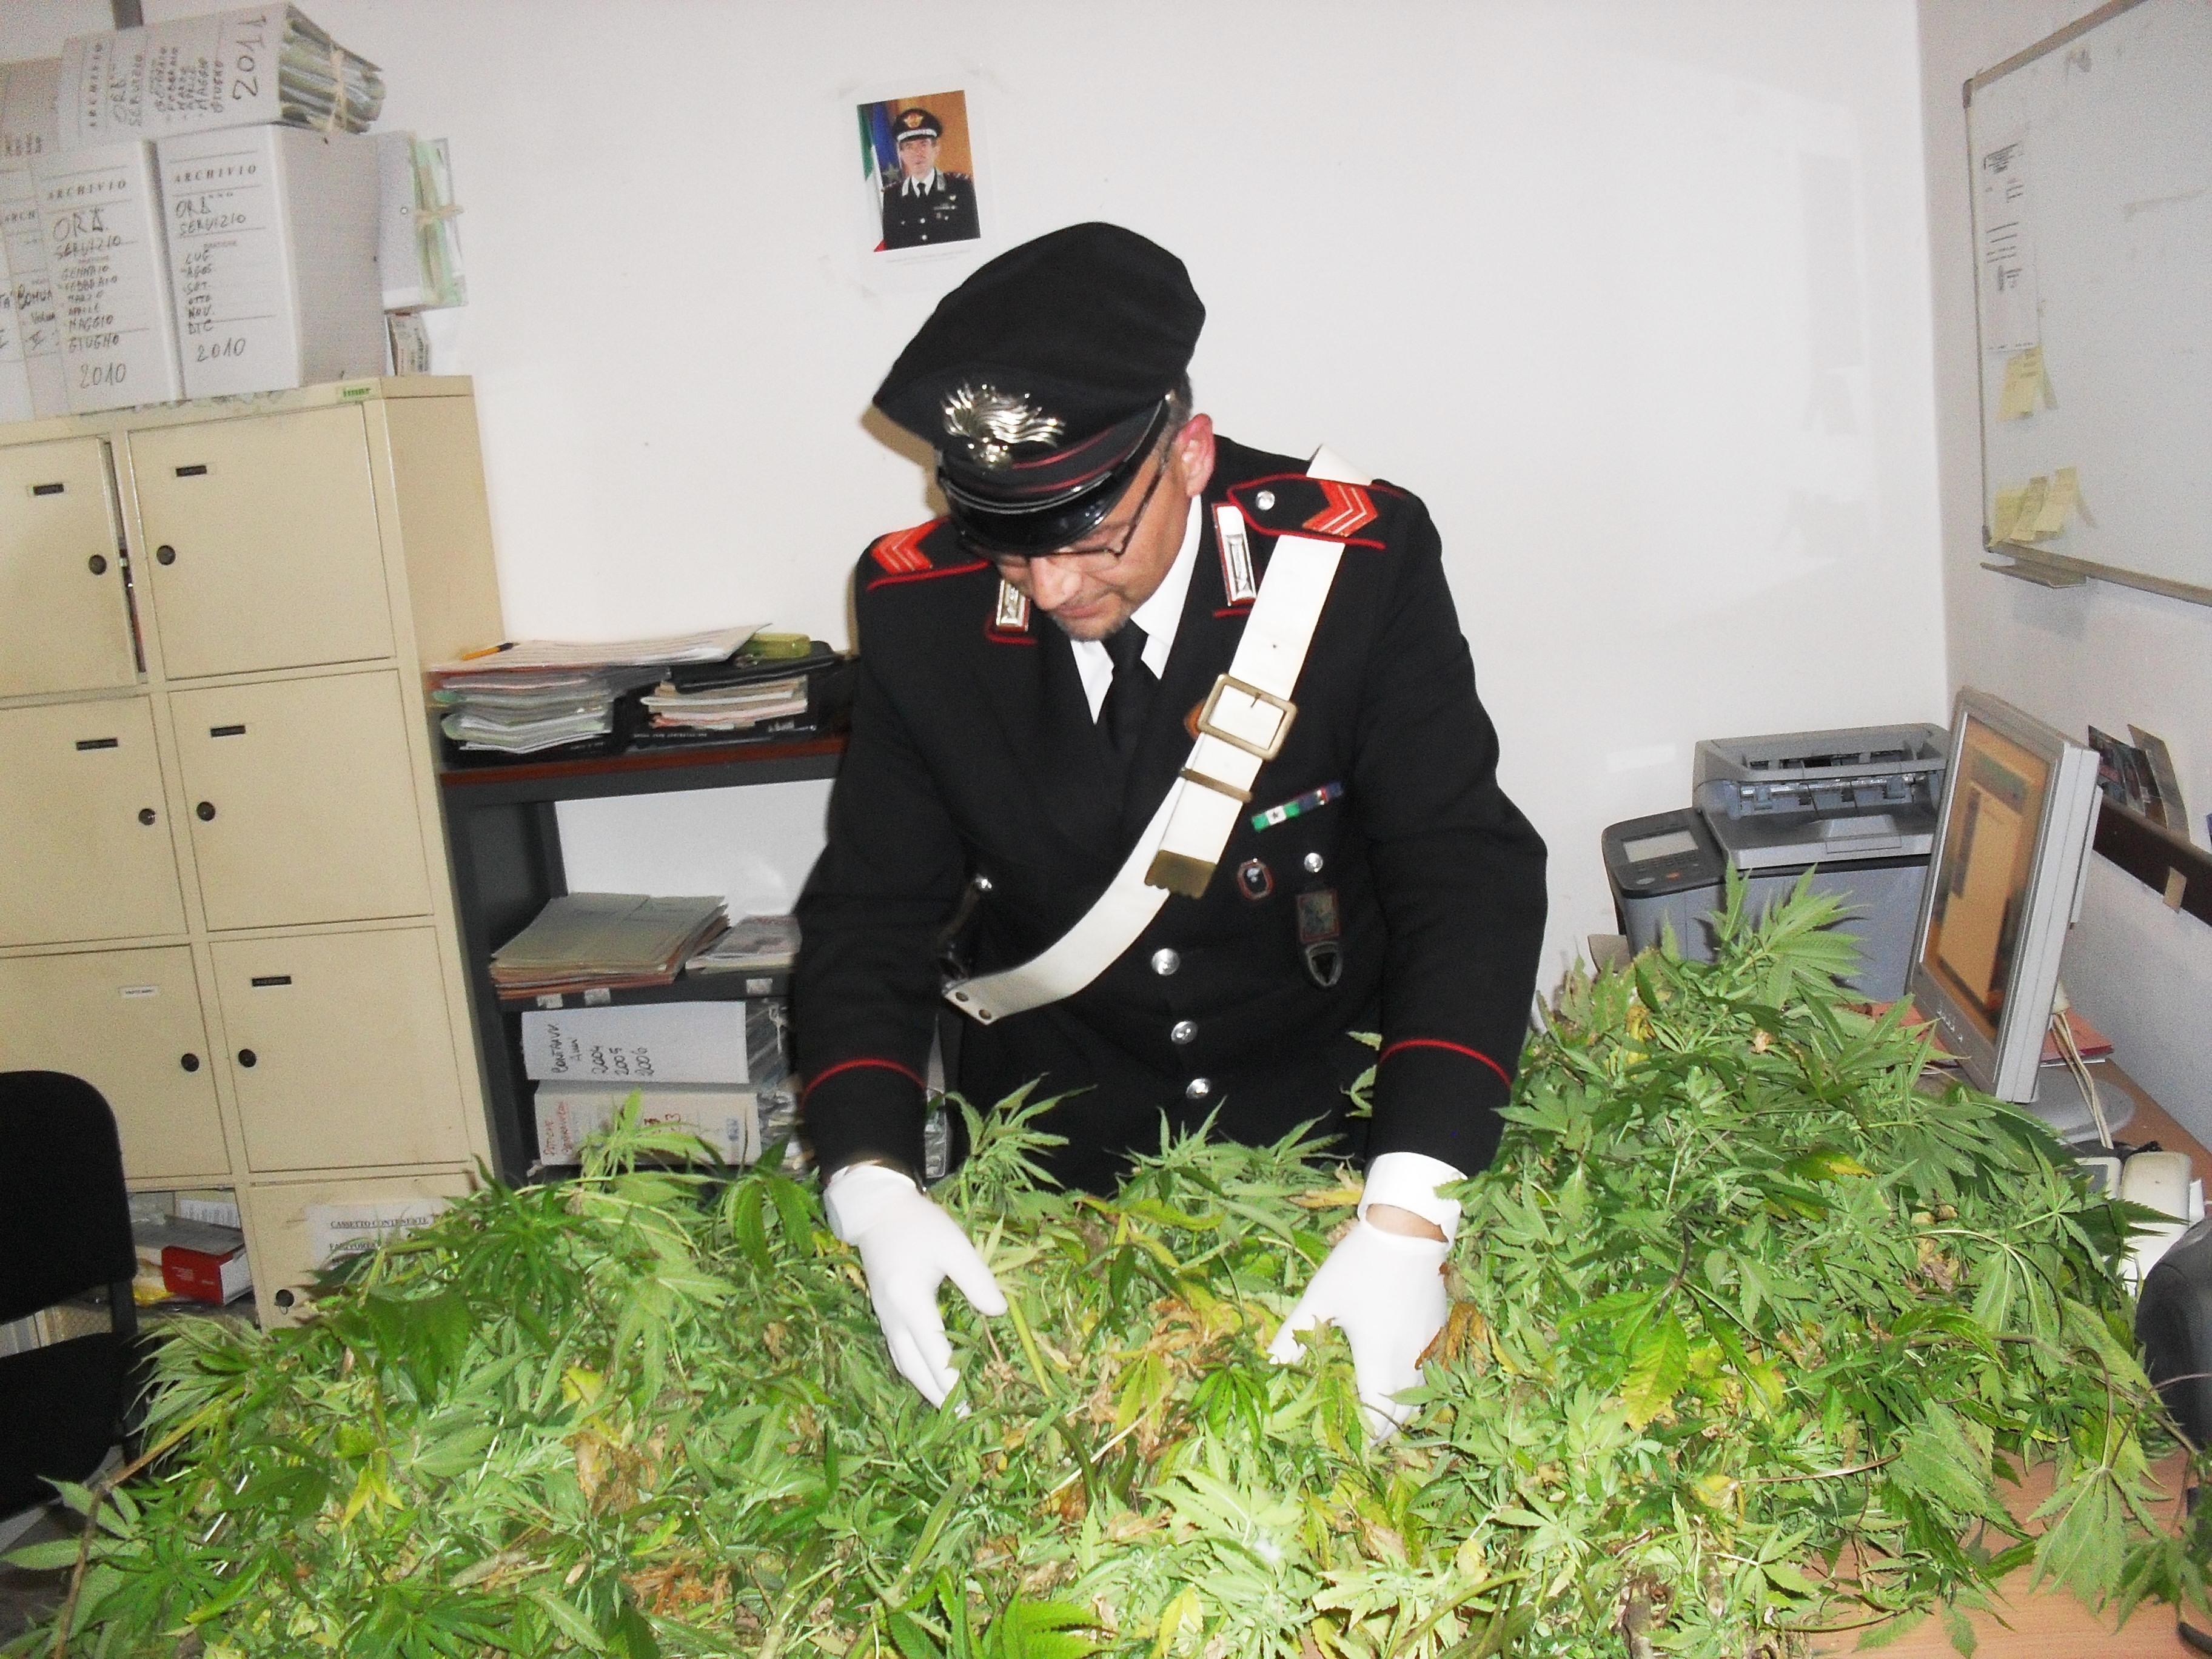 cannabis-carabinieri-ok-764645654